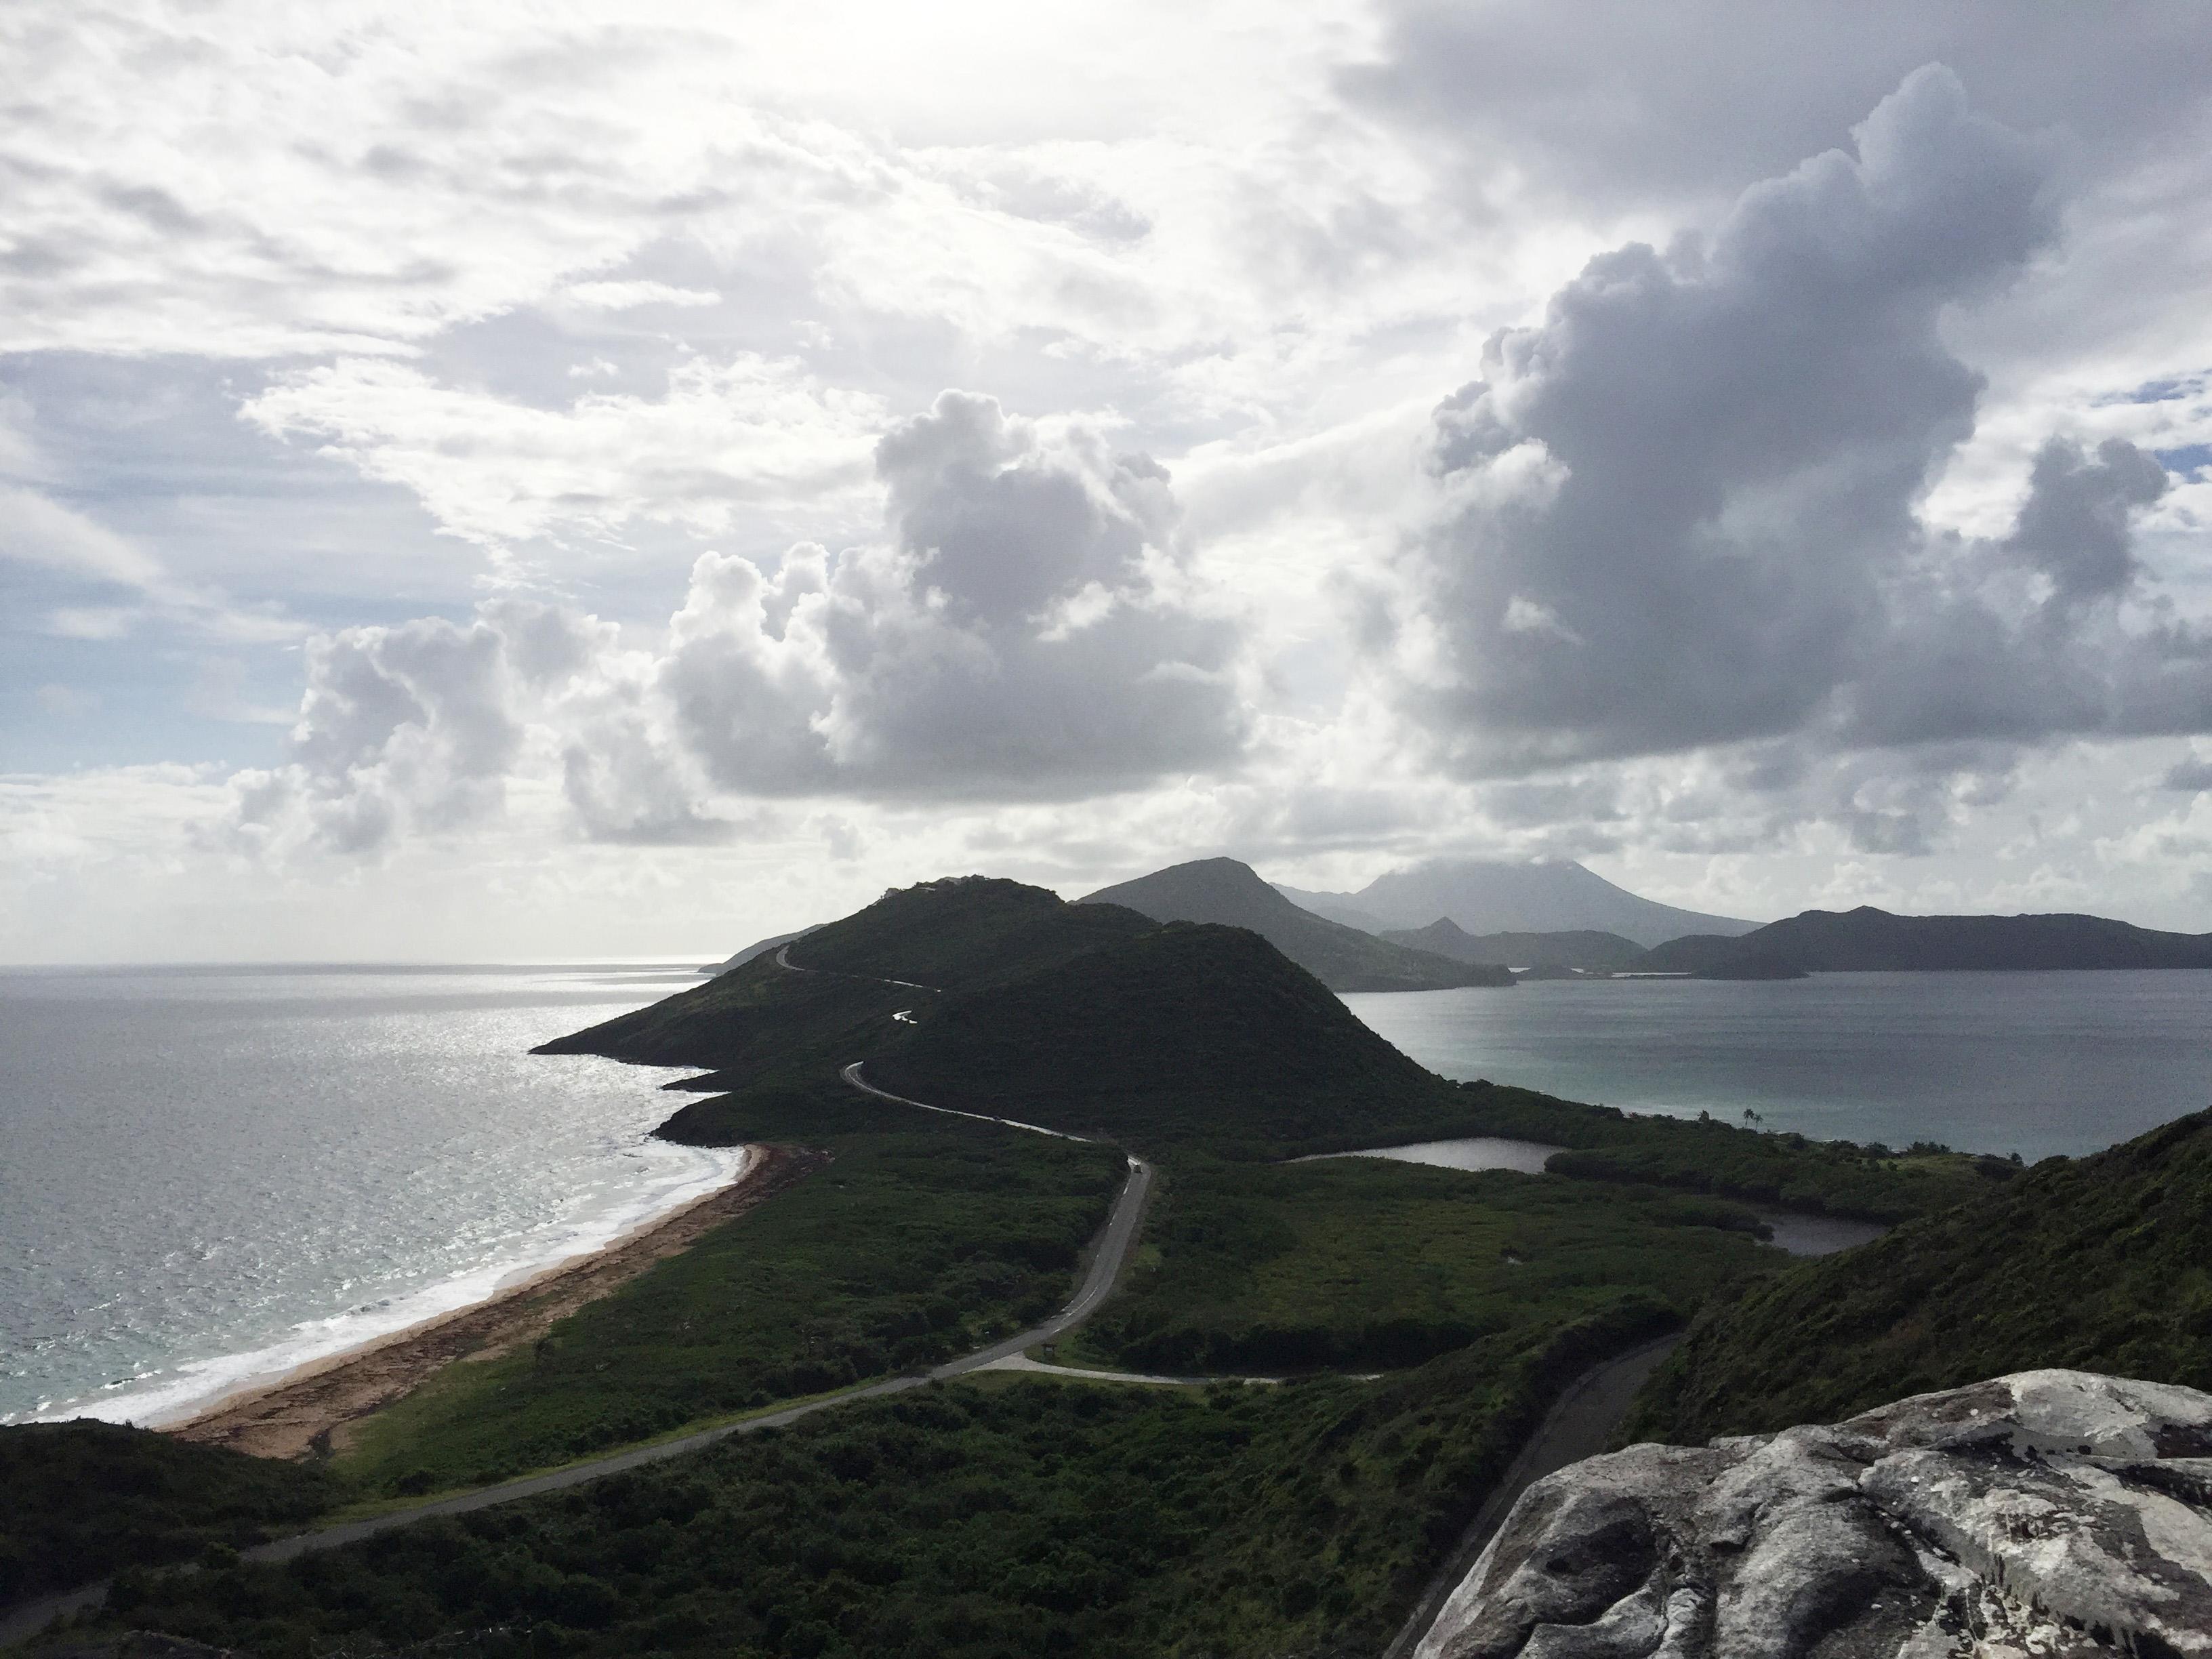 St. Kitts faces the Caribbean Sea and Atlantic Ocean